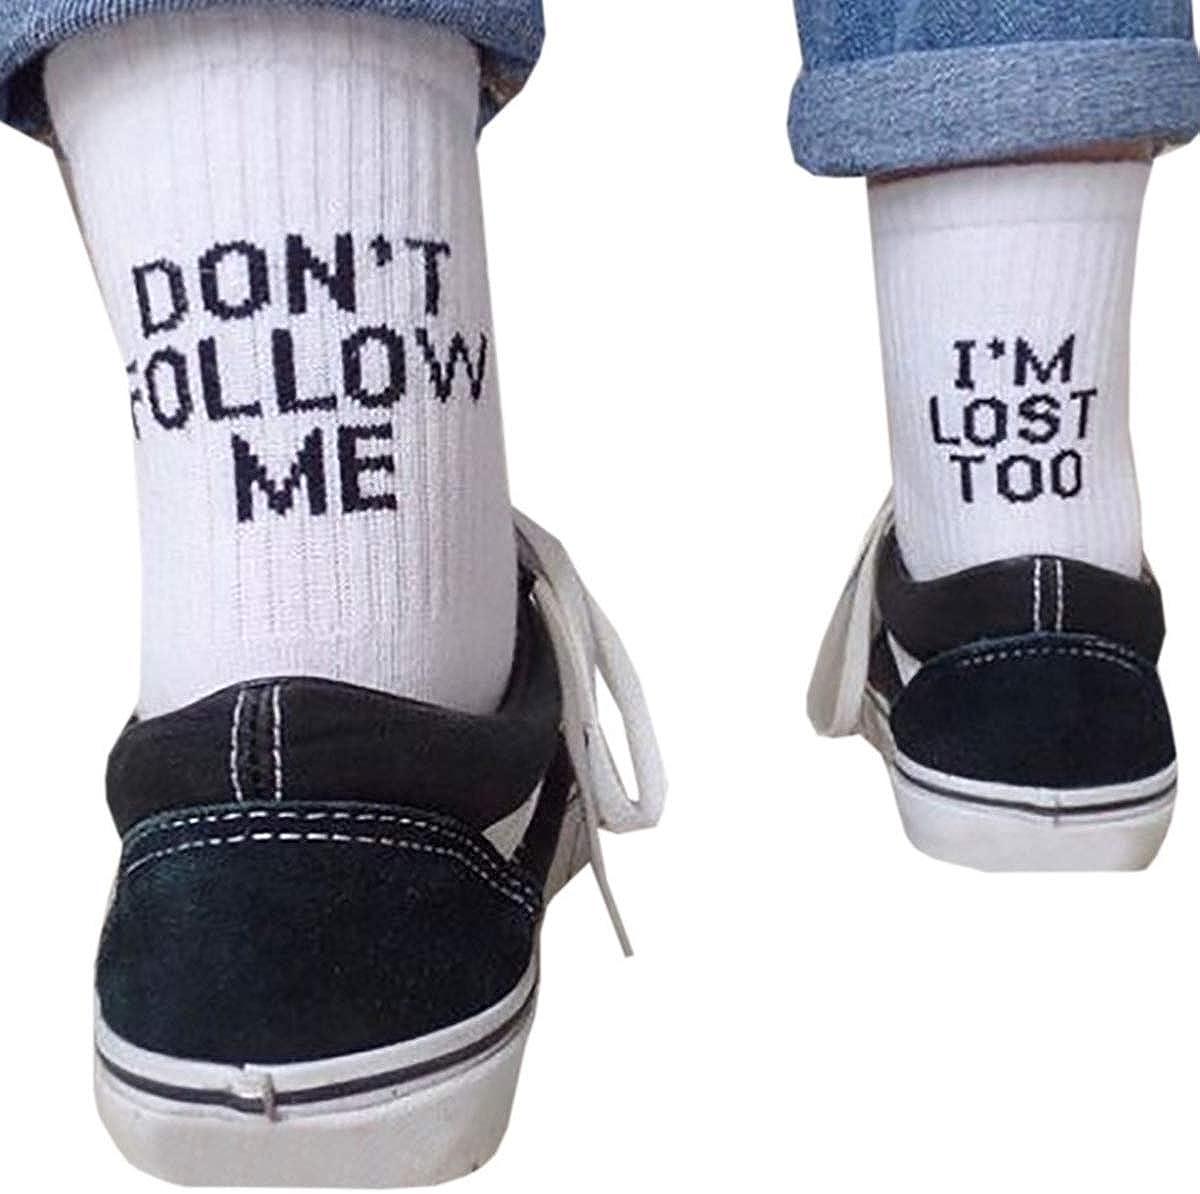 DERCLIVE Fashion Men Women Letter Funny Casual Sport Cotton White Black Skateboard Socks,Black/White